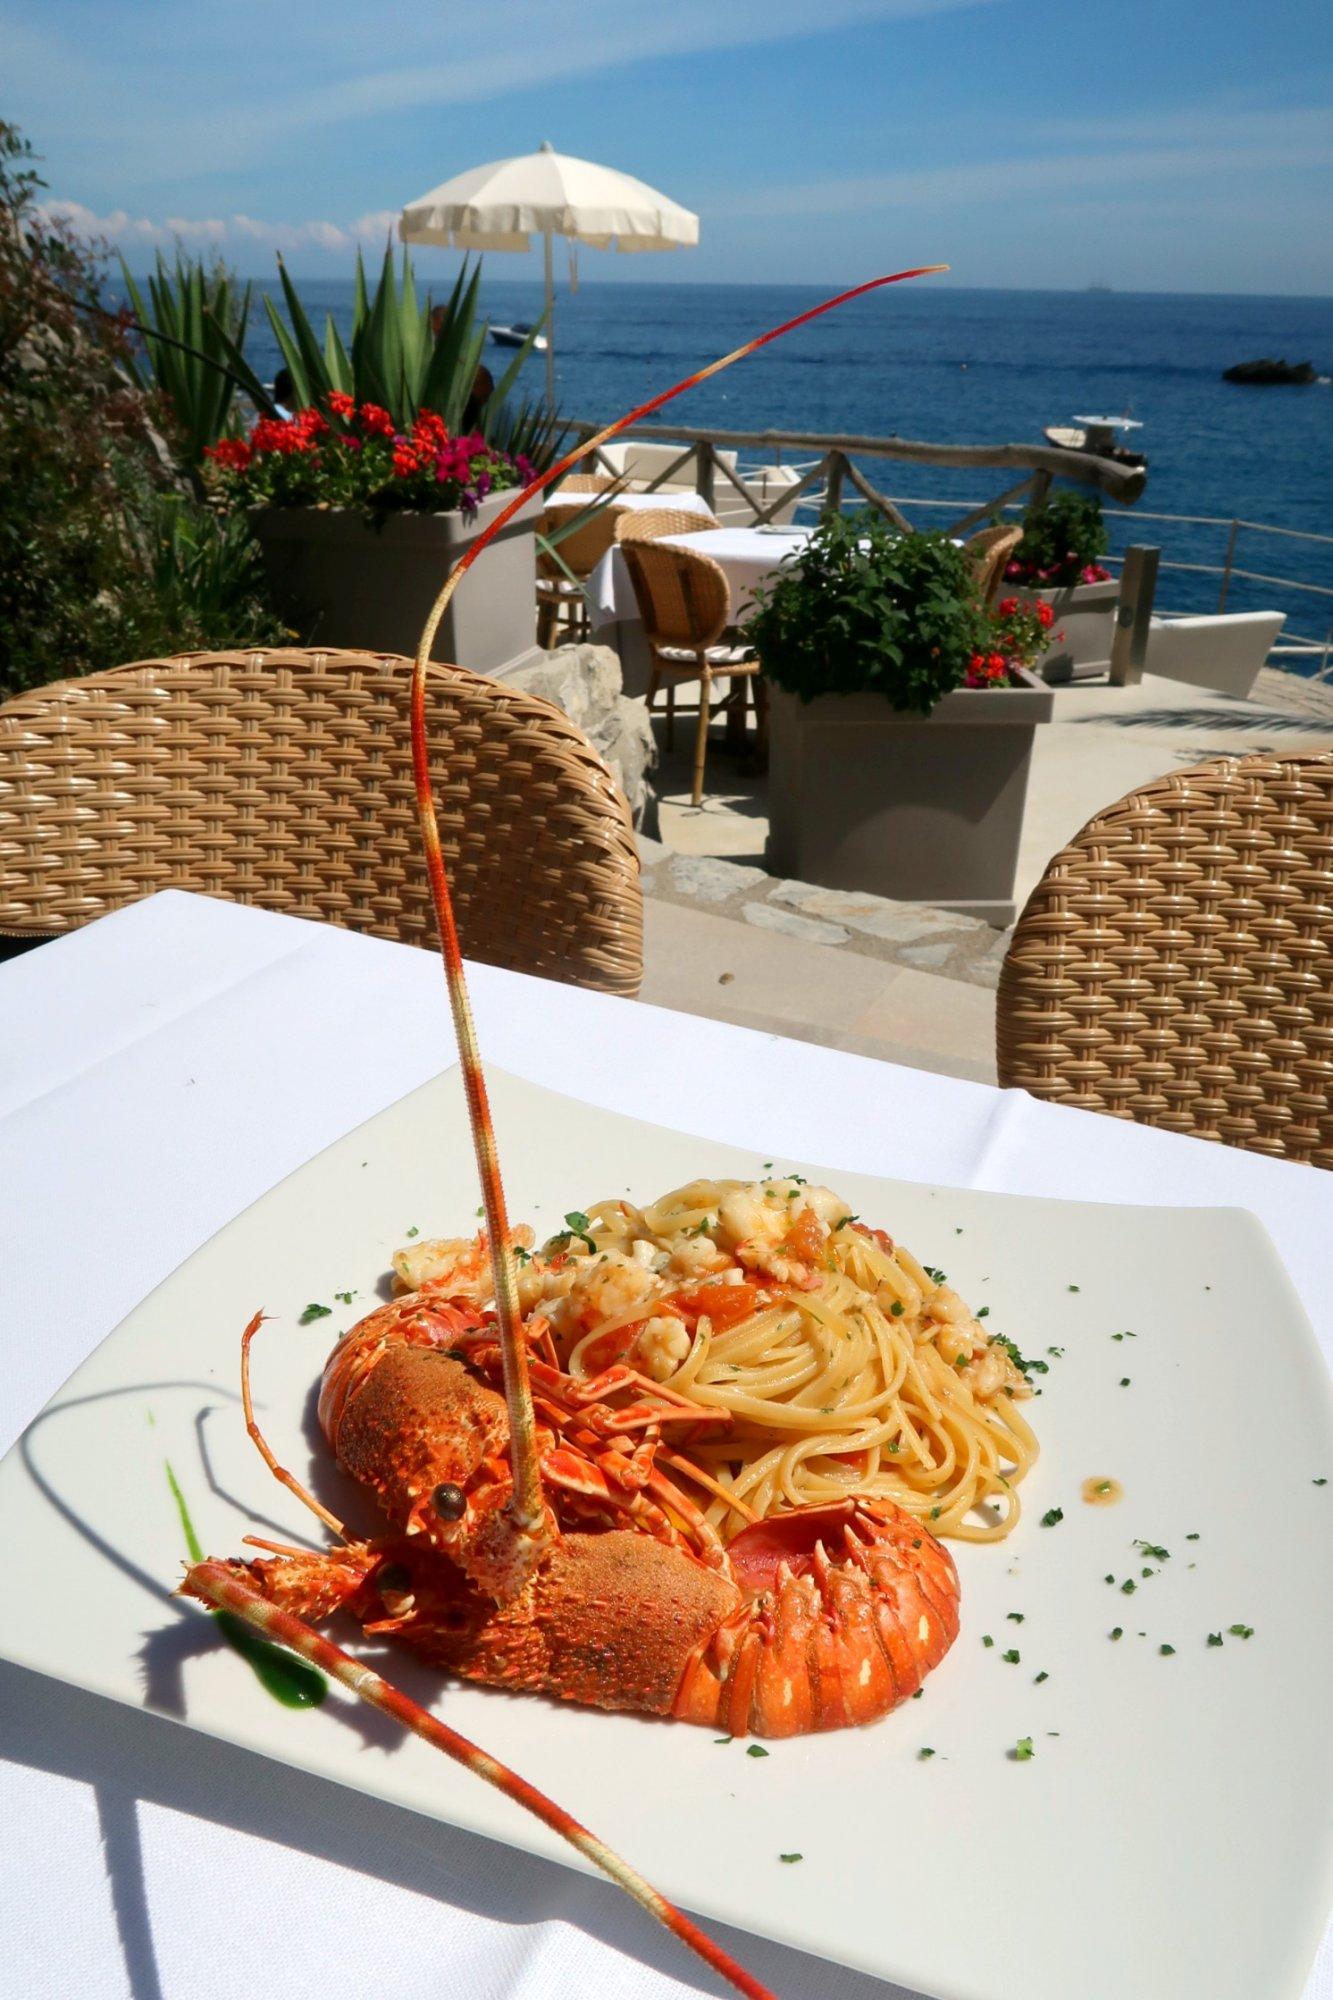 Conca del Sogno: Idyllic beach dining in Amalfi.